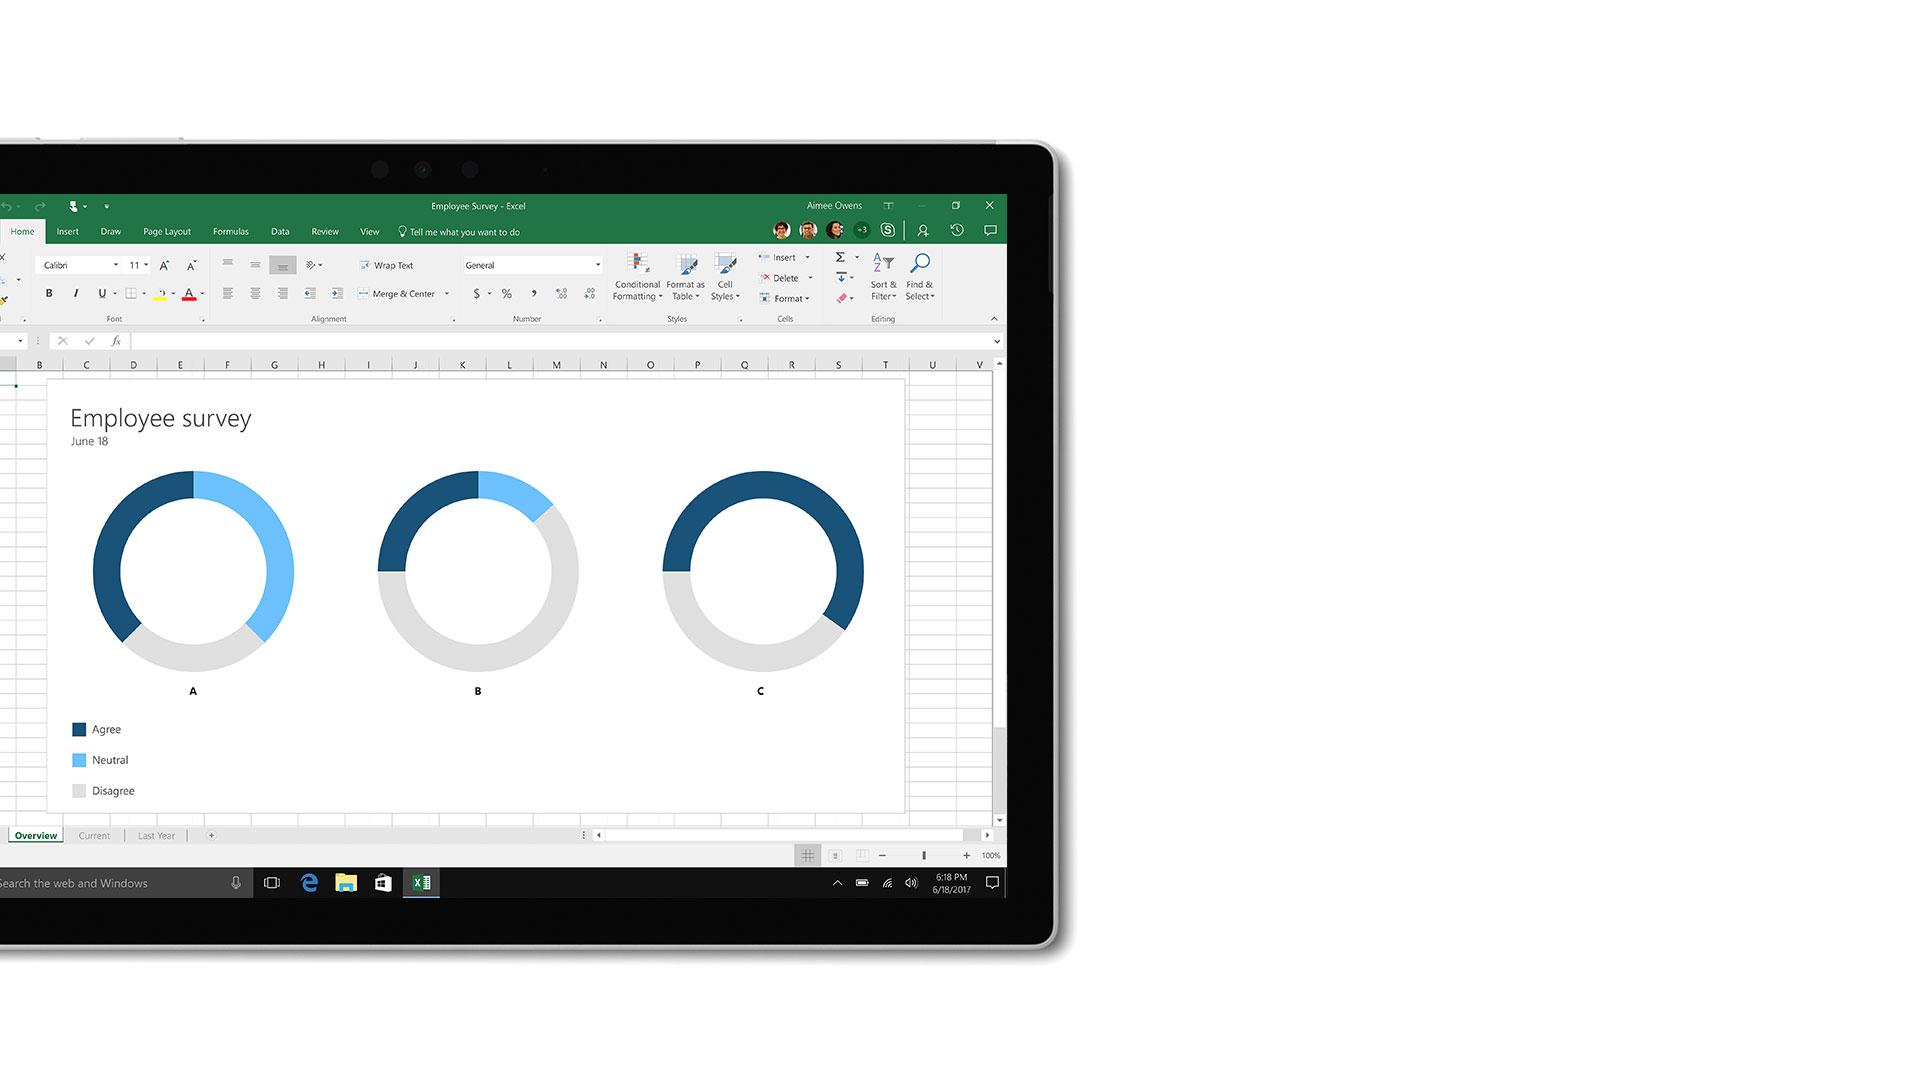 Microsoft Excel의 사용자 인터페이스 이미지